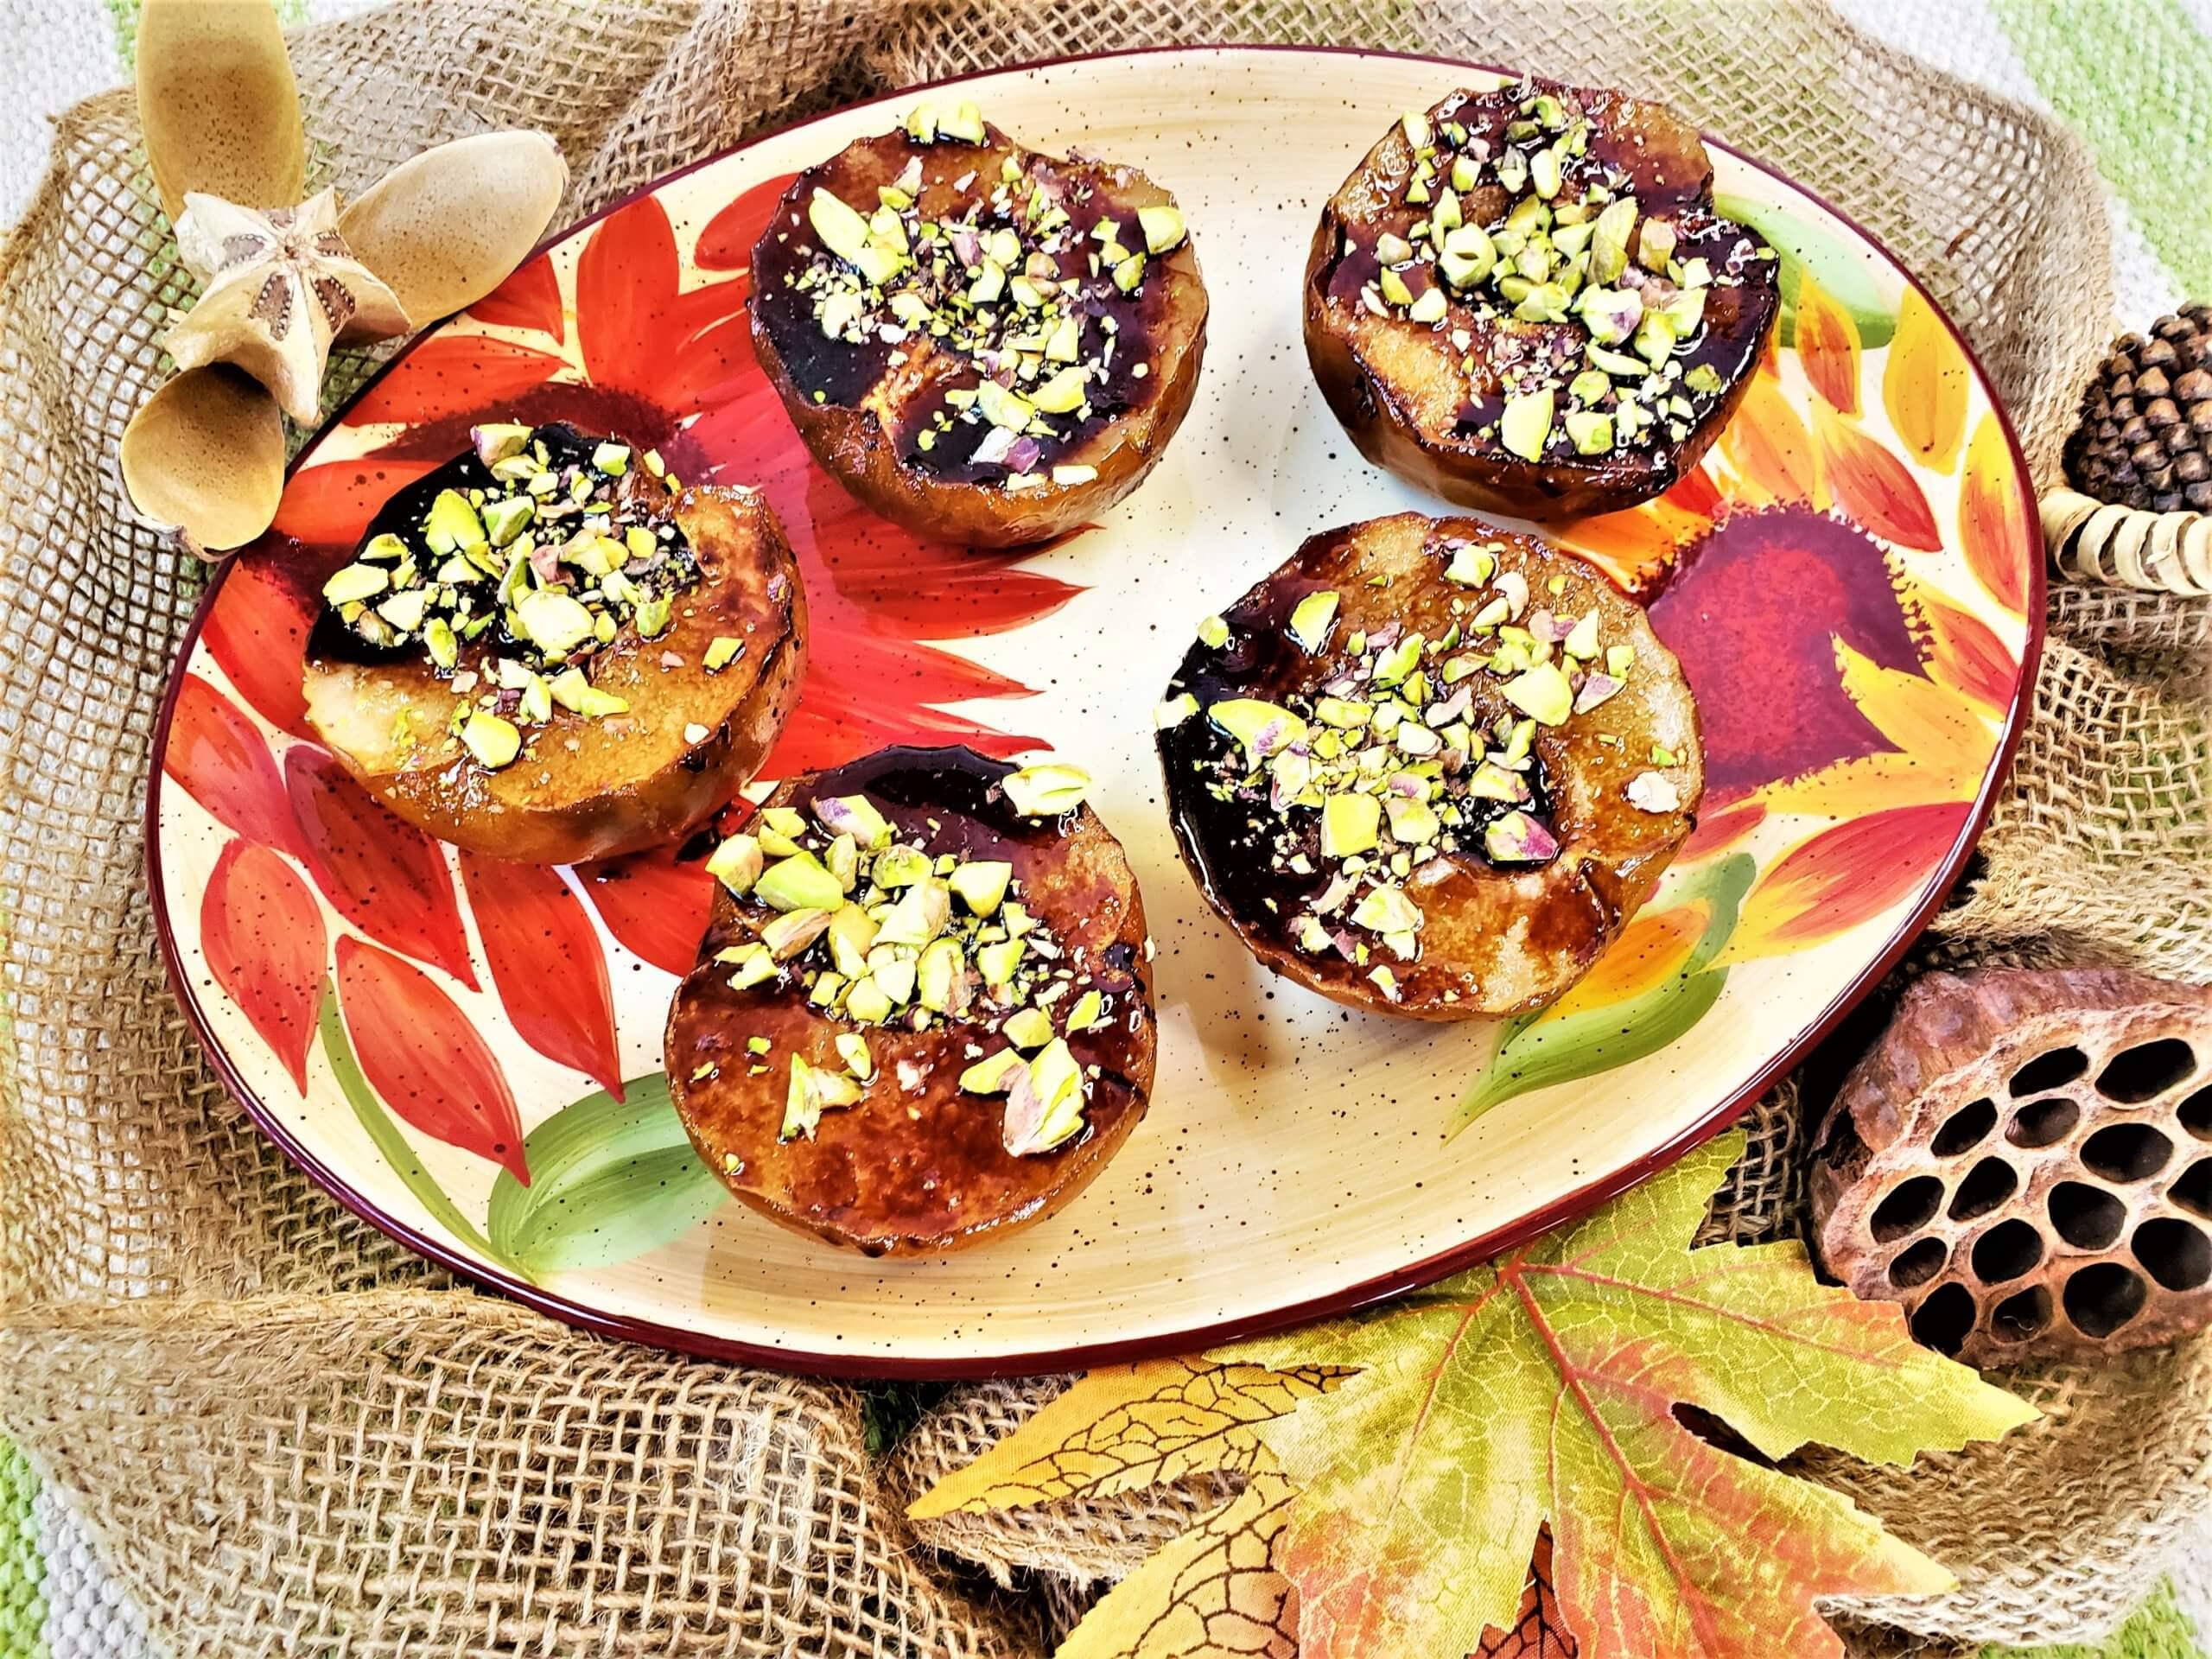 pomegranate glazed roasted asian pears